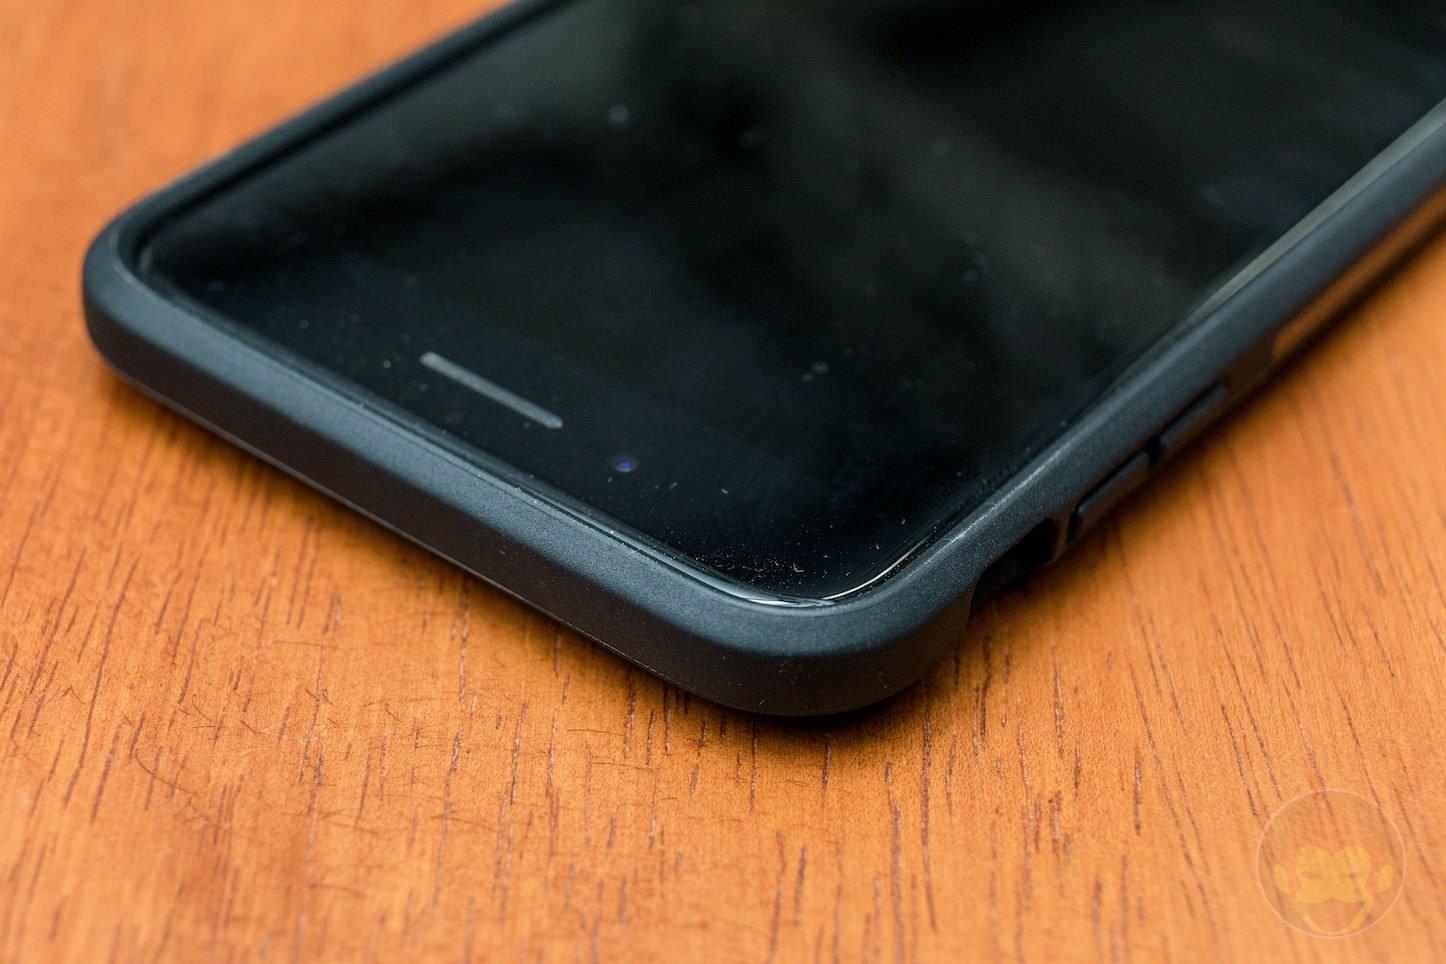 Anker-KARAPAX-Shield-for-iPhone8Plus-09.jpg